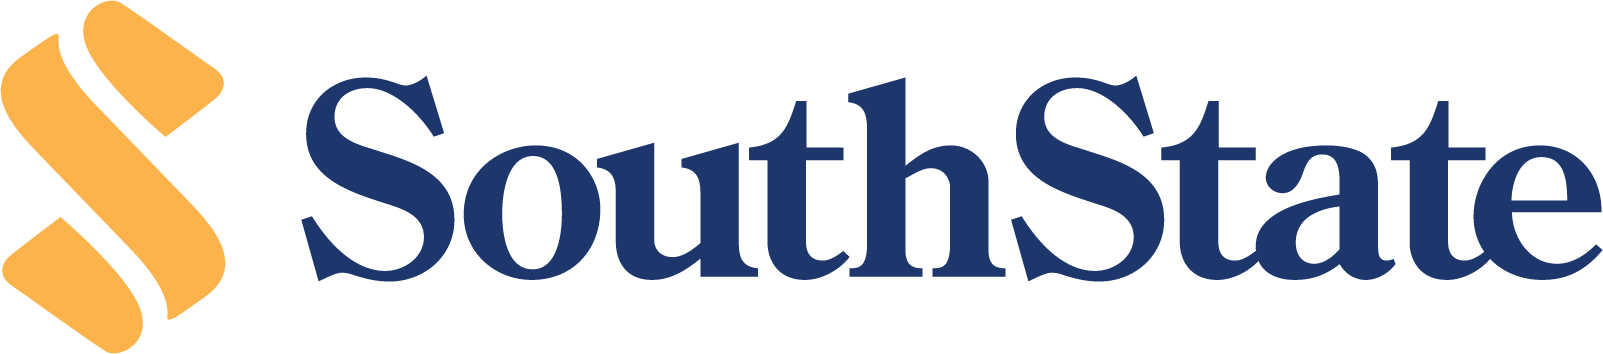 Southeastern University Logo for Catapult Lakeland Corporate Sponsorship